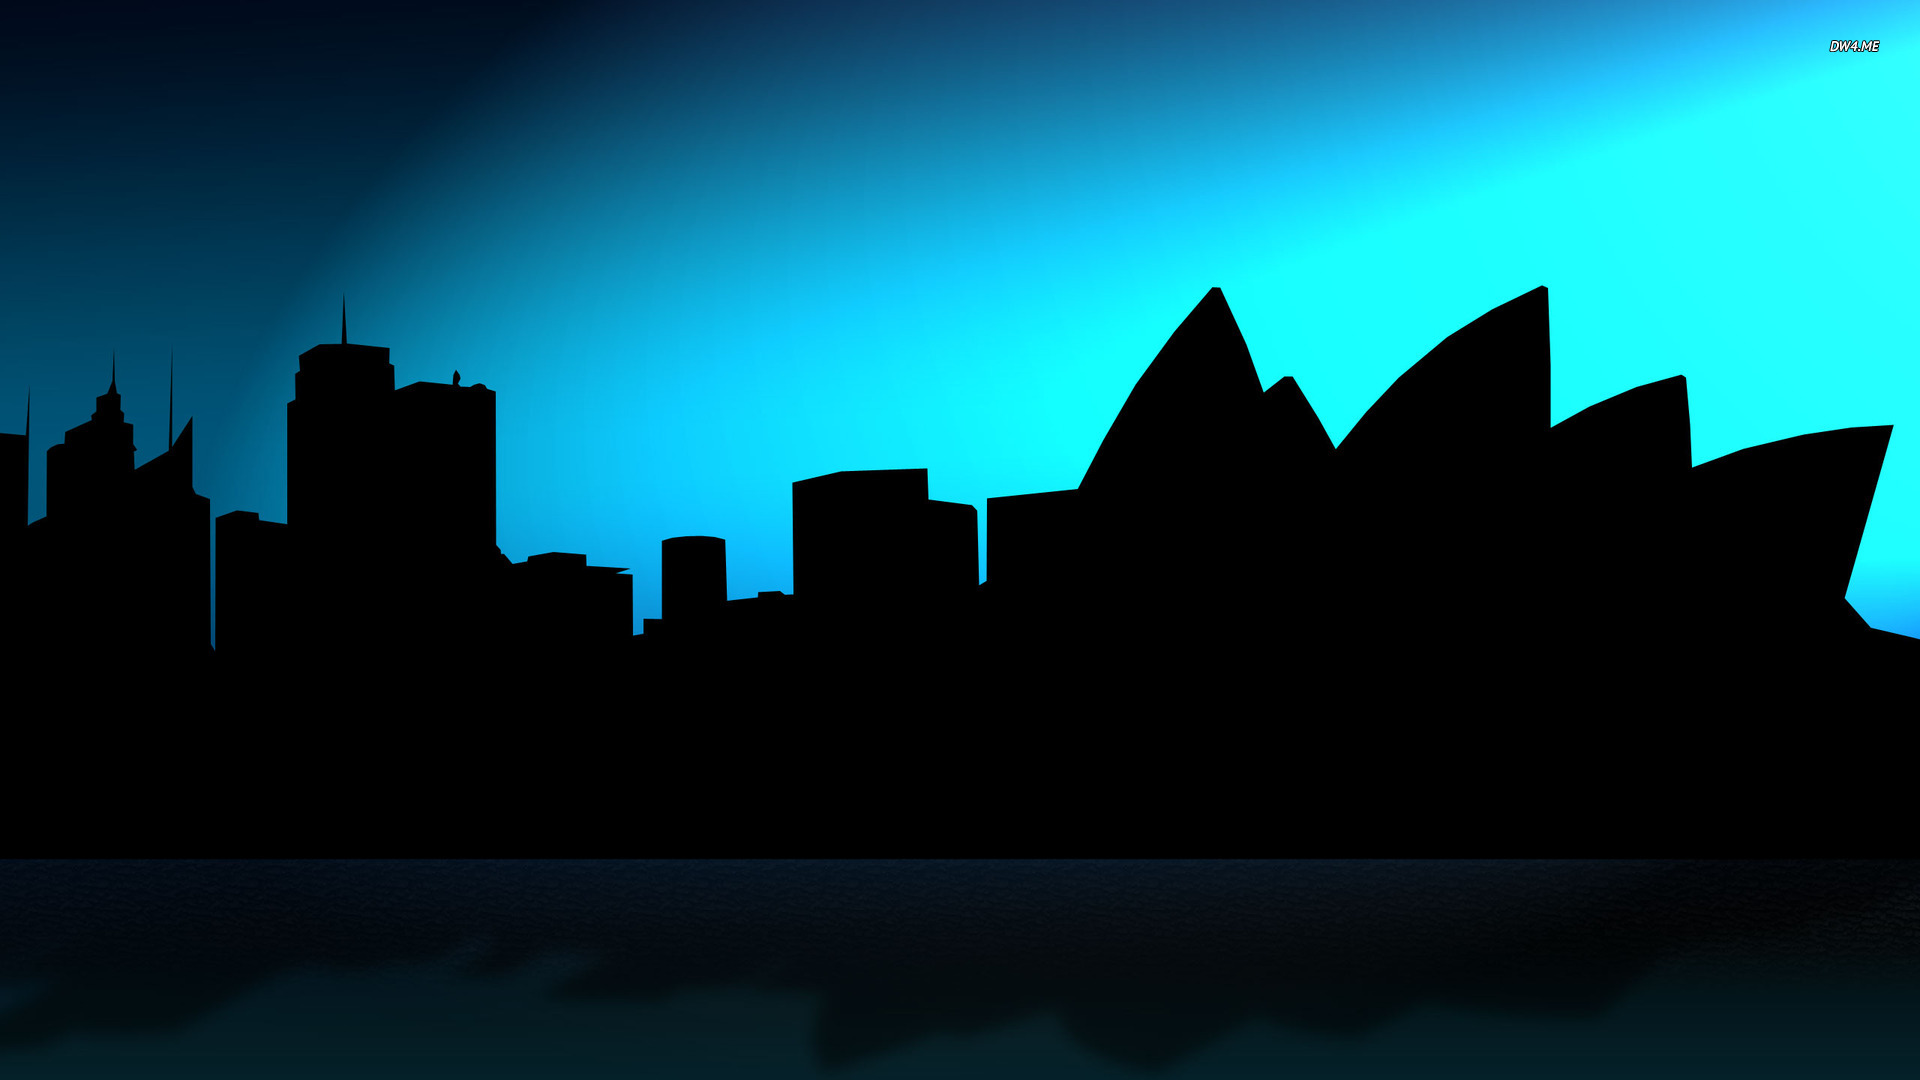 Skyline Silhouette Wallpaper - ClipArt Best